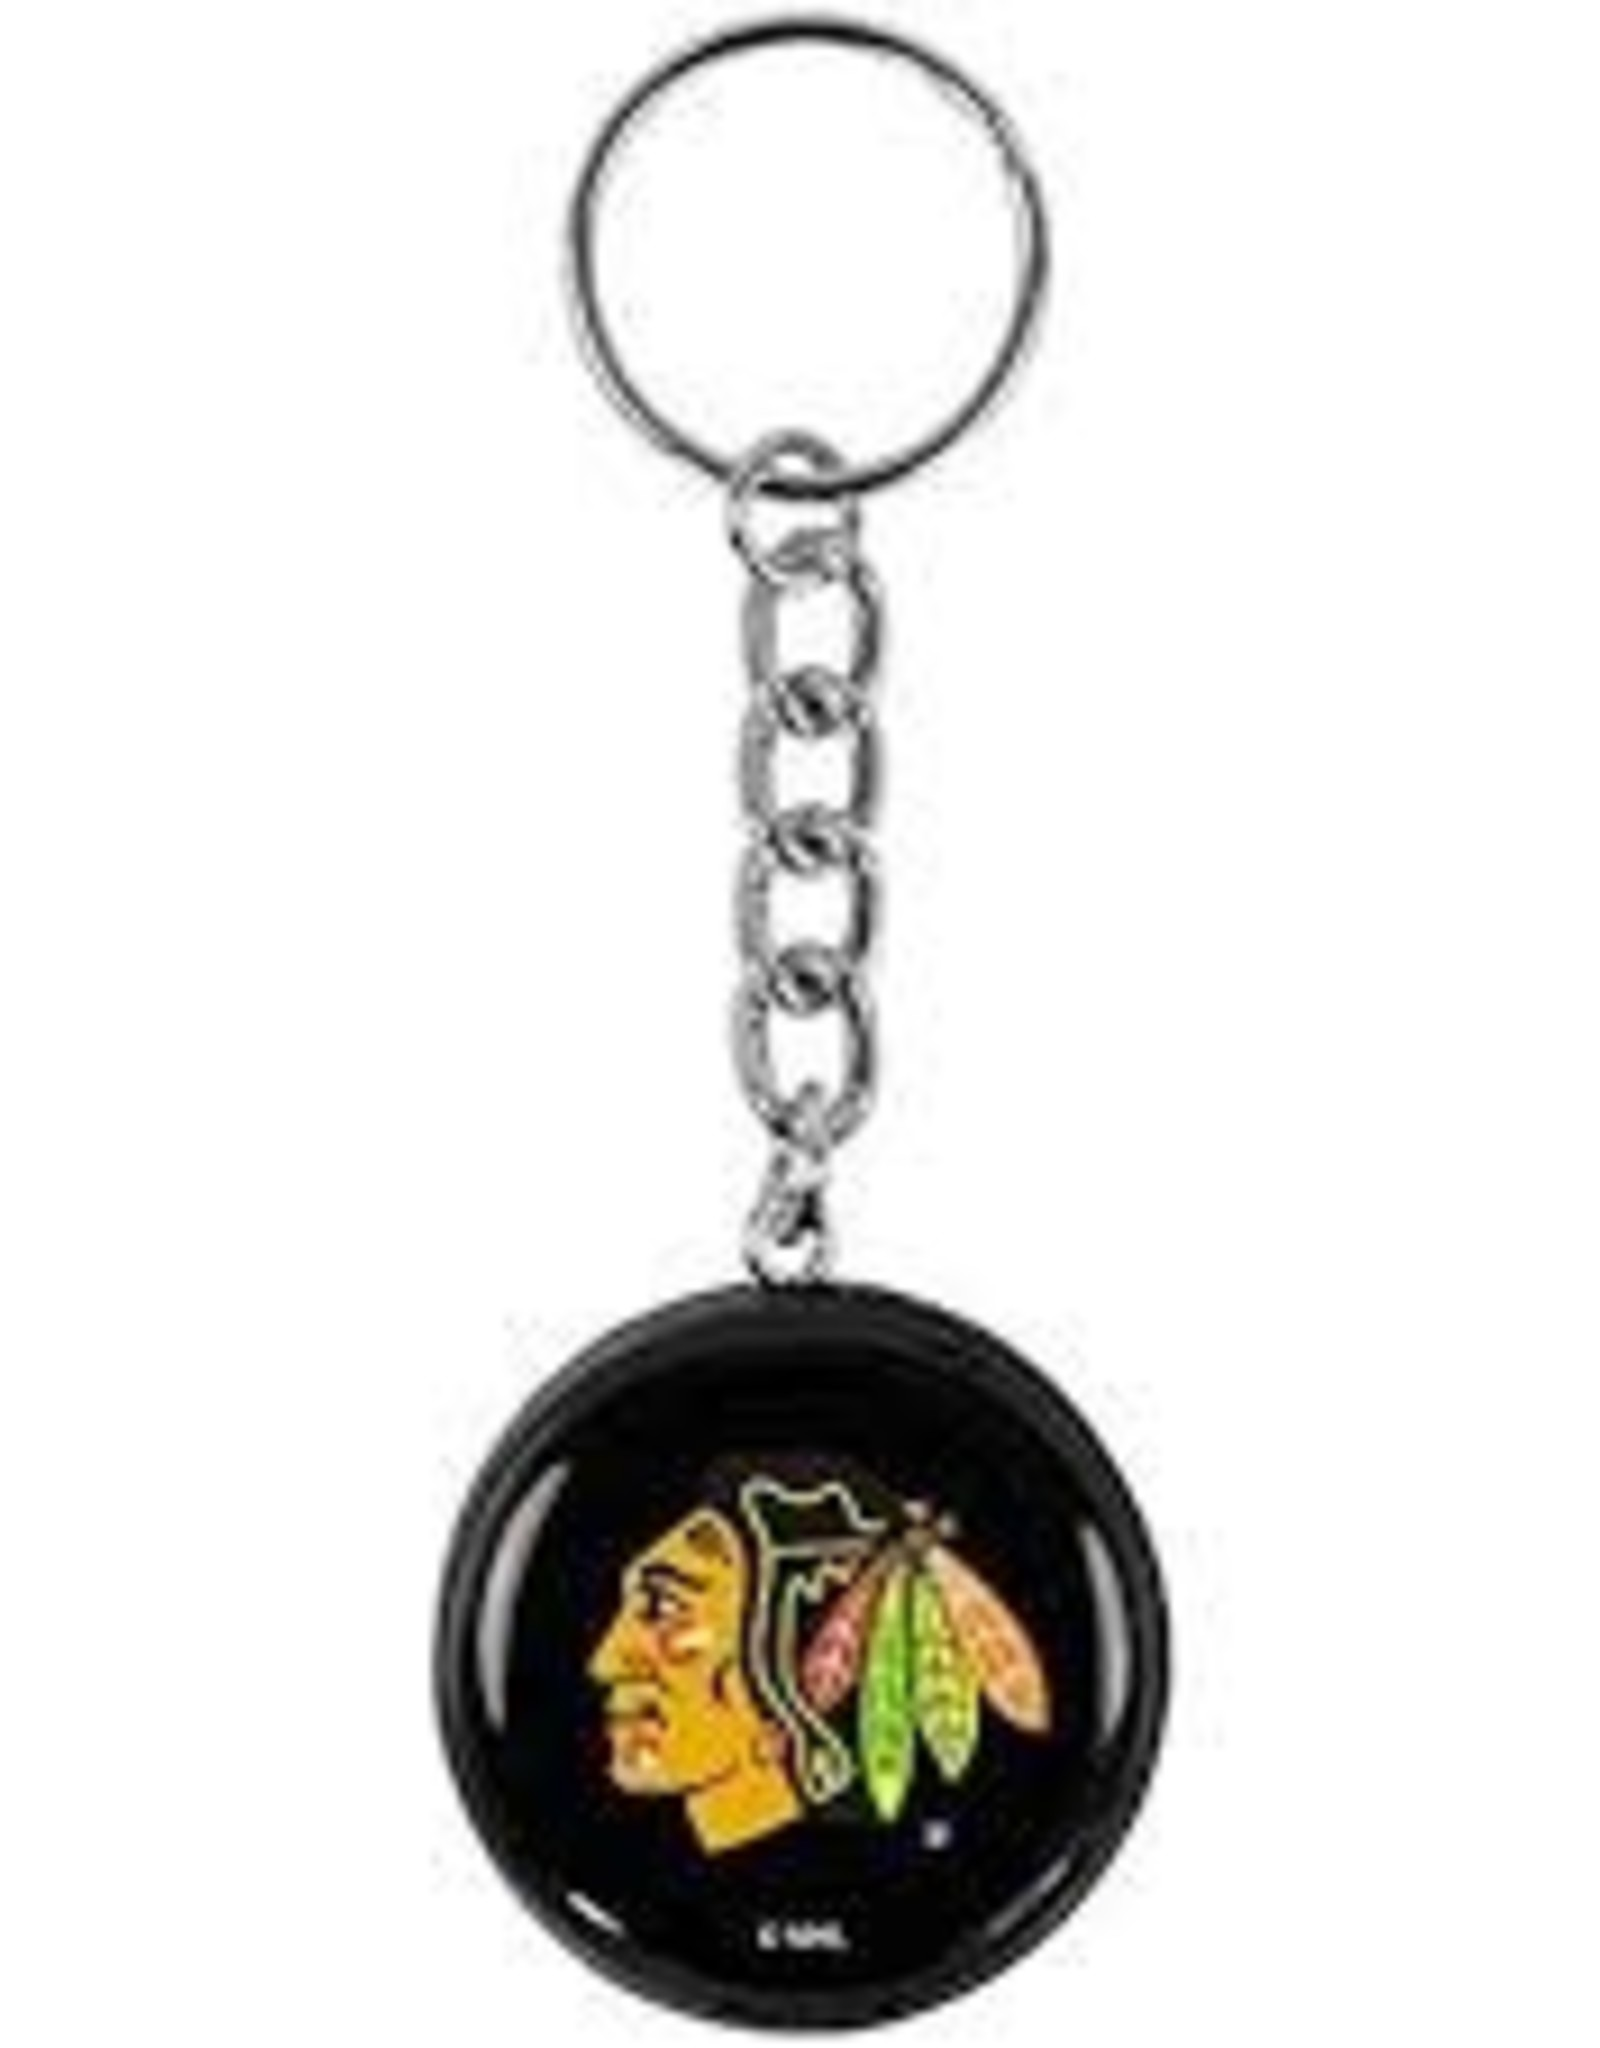 NHL Key Chain Puck CHIC